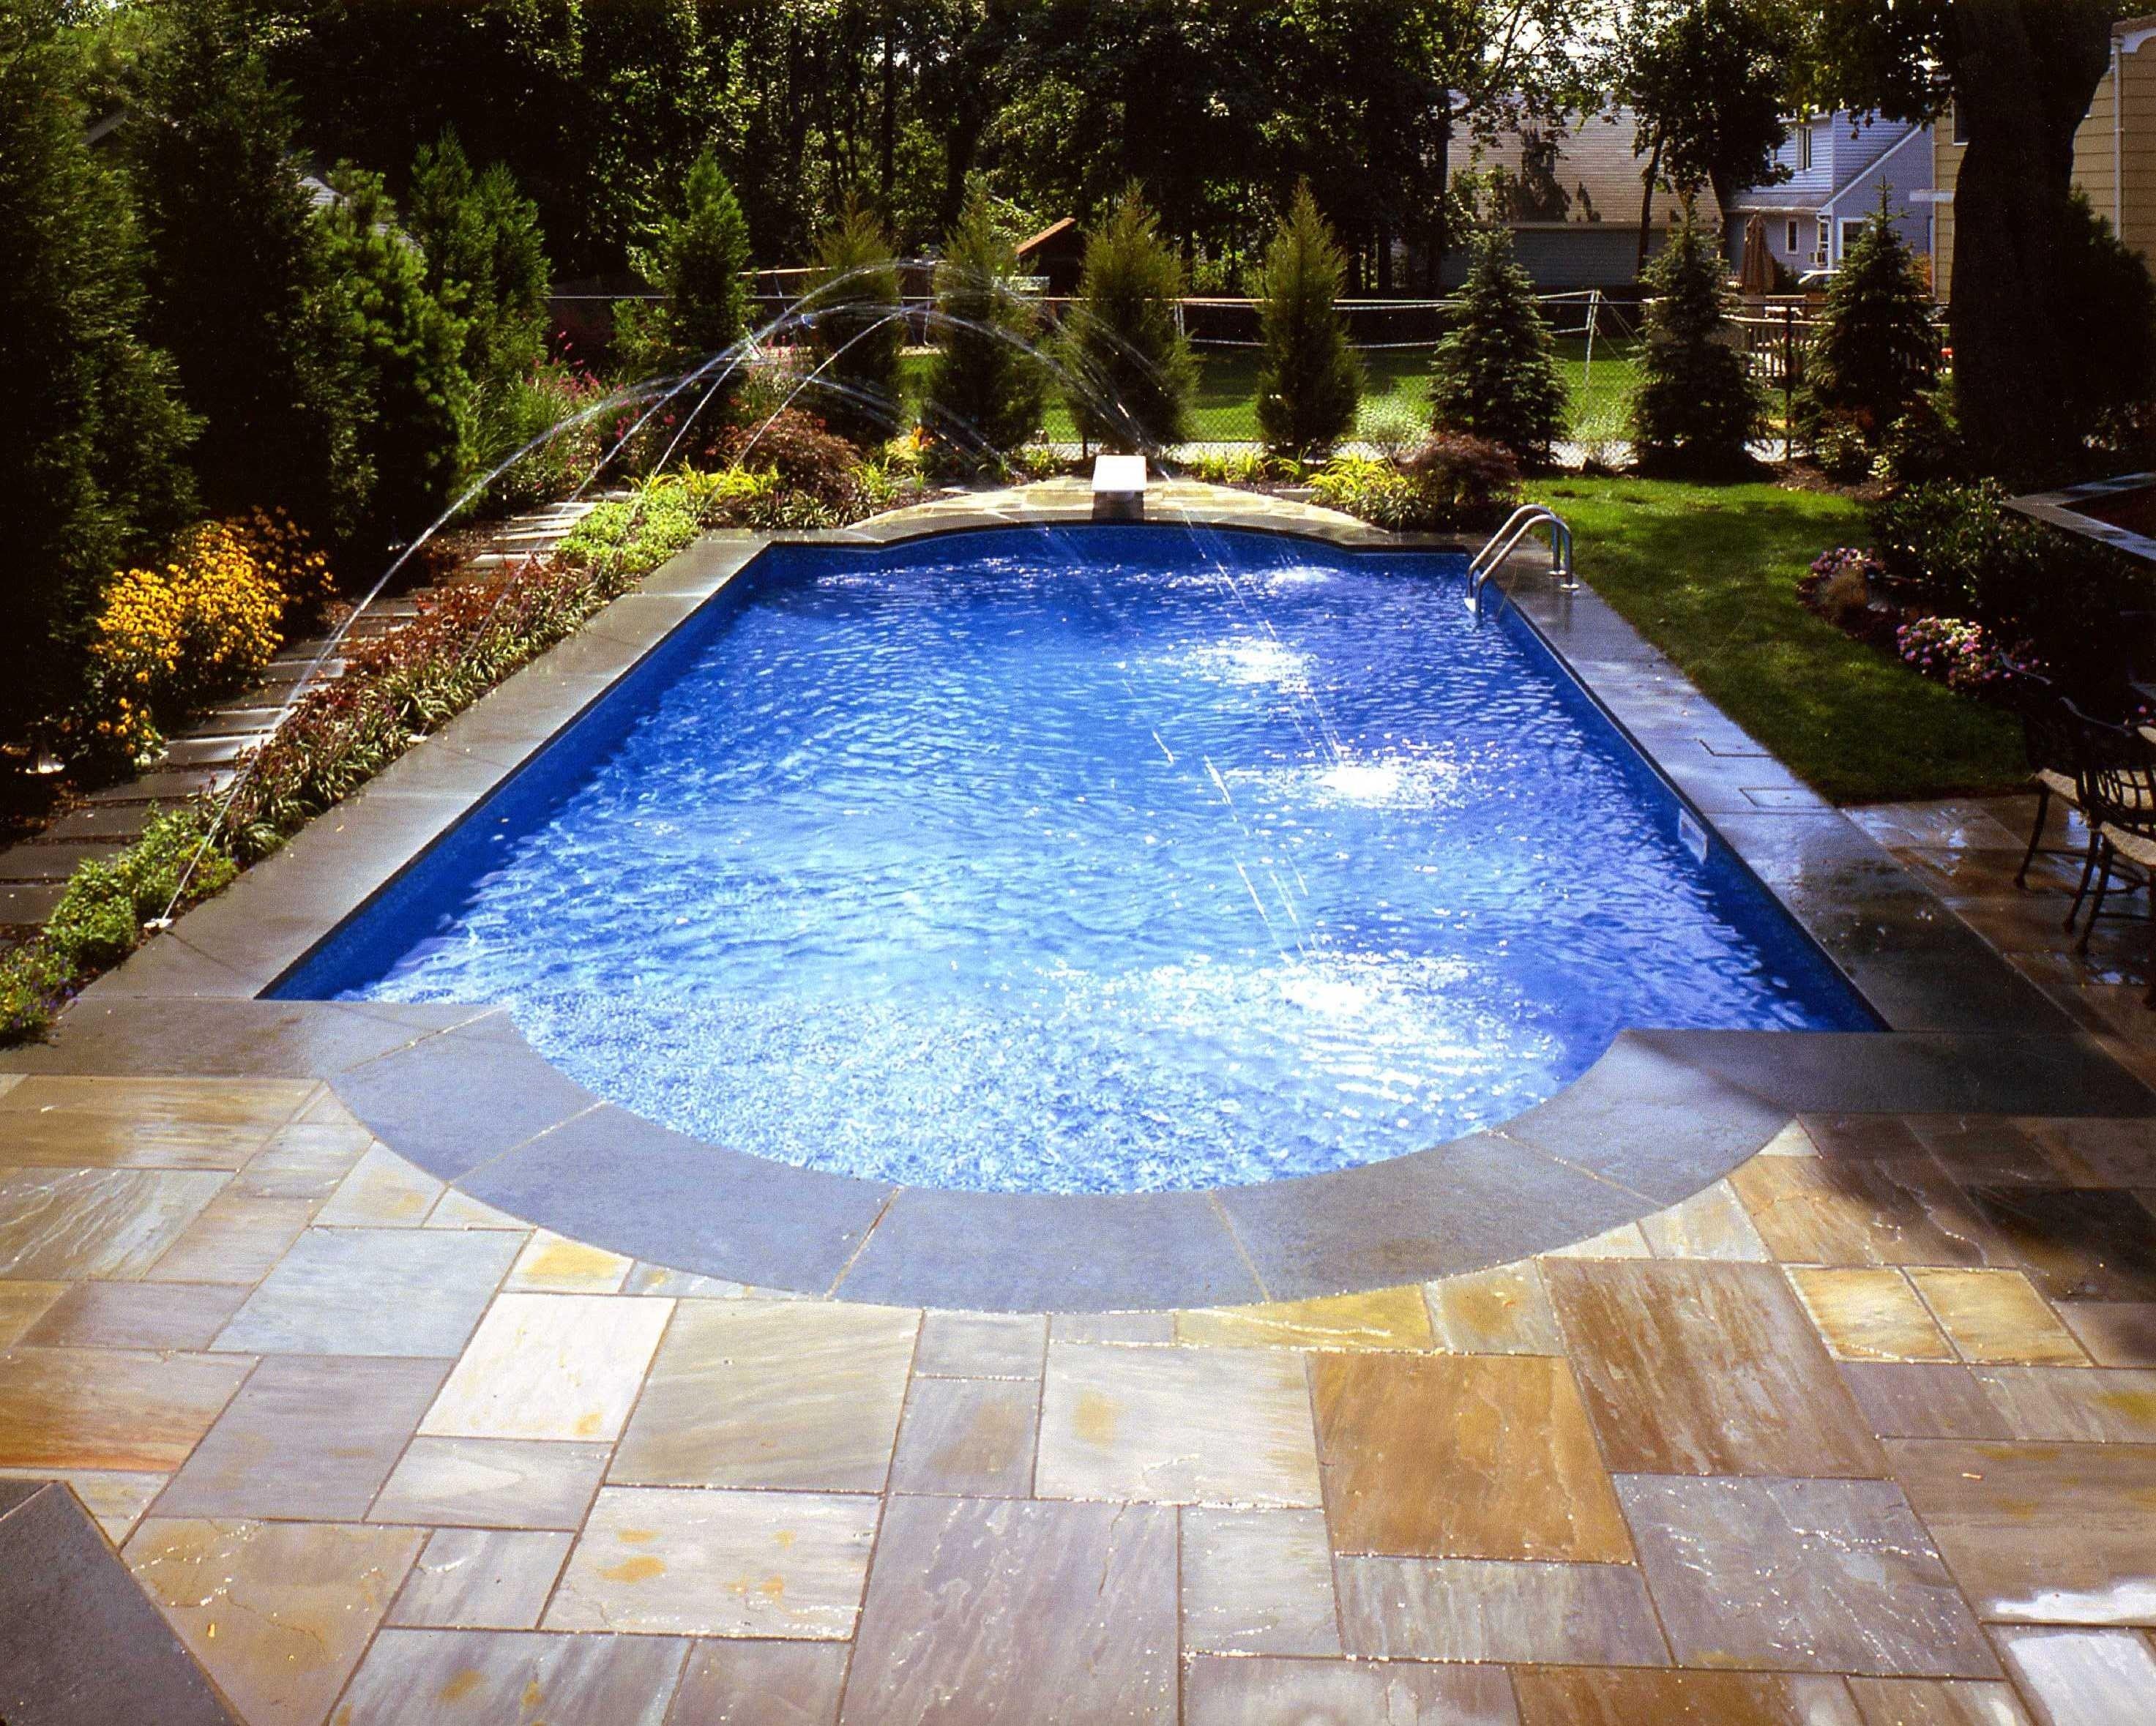 10 Elegant Pool Deck Ideas For Inground Pools inground swimming pool deck ideas dma homes 30702 2021